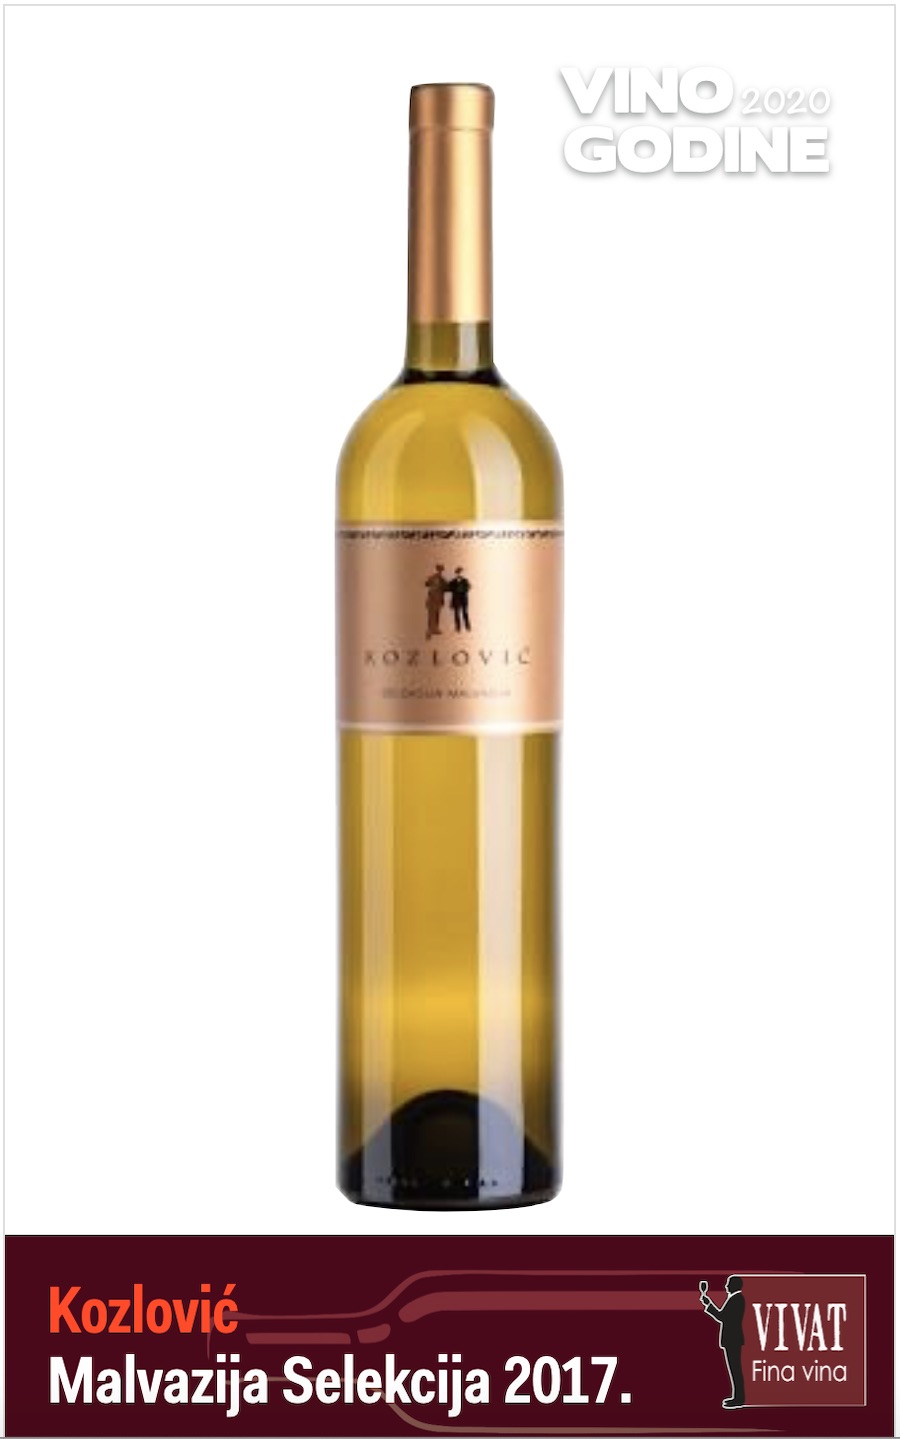 vino-godine-2020-kozlovic-malvazija-selekcija